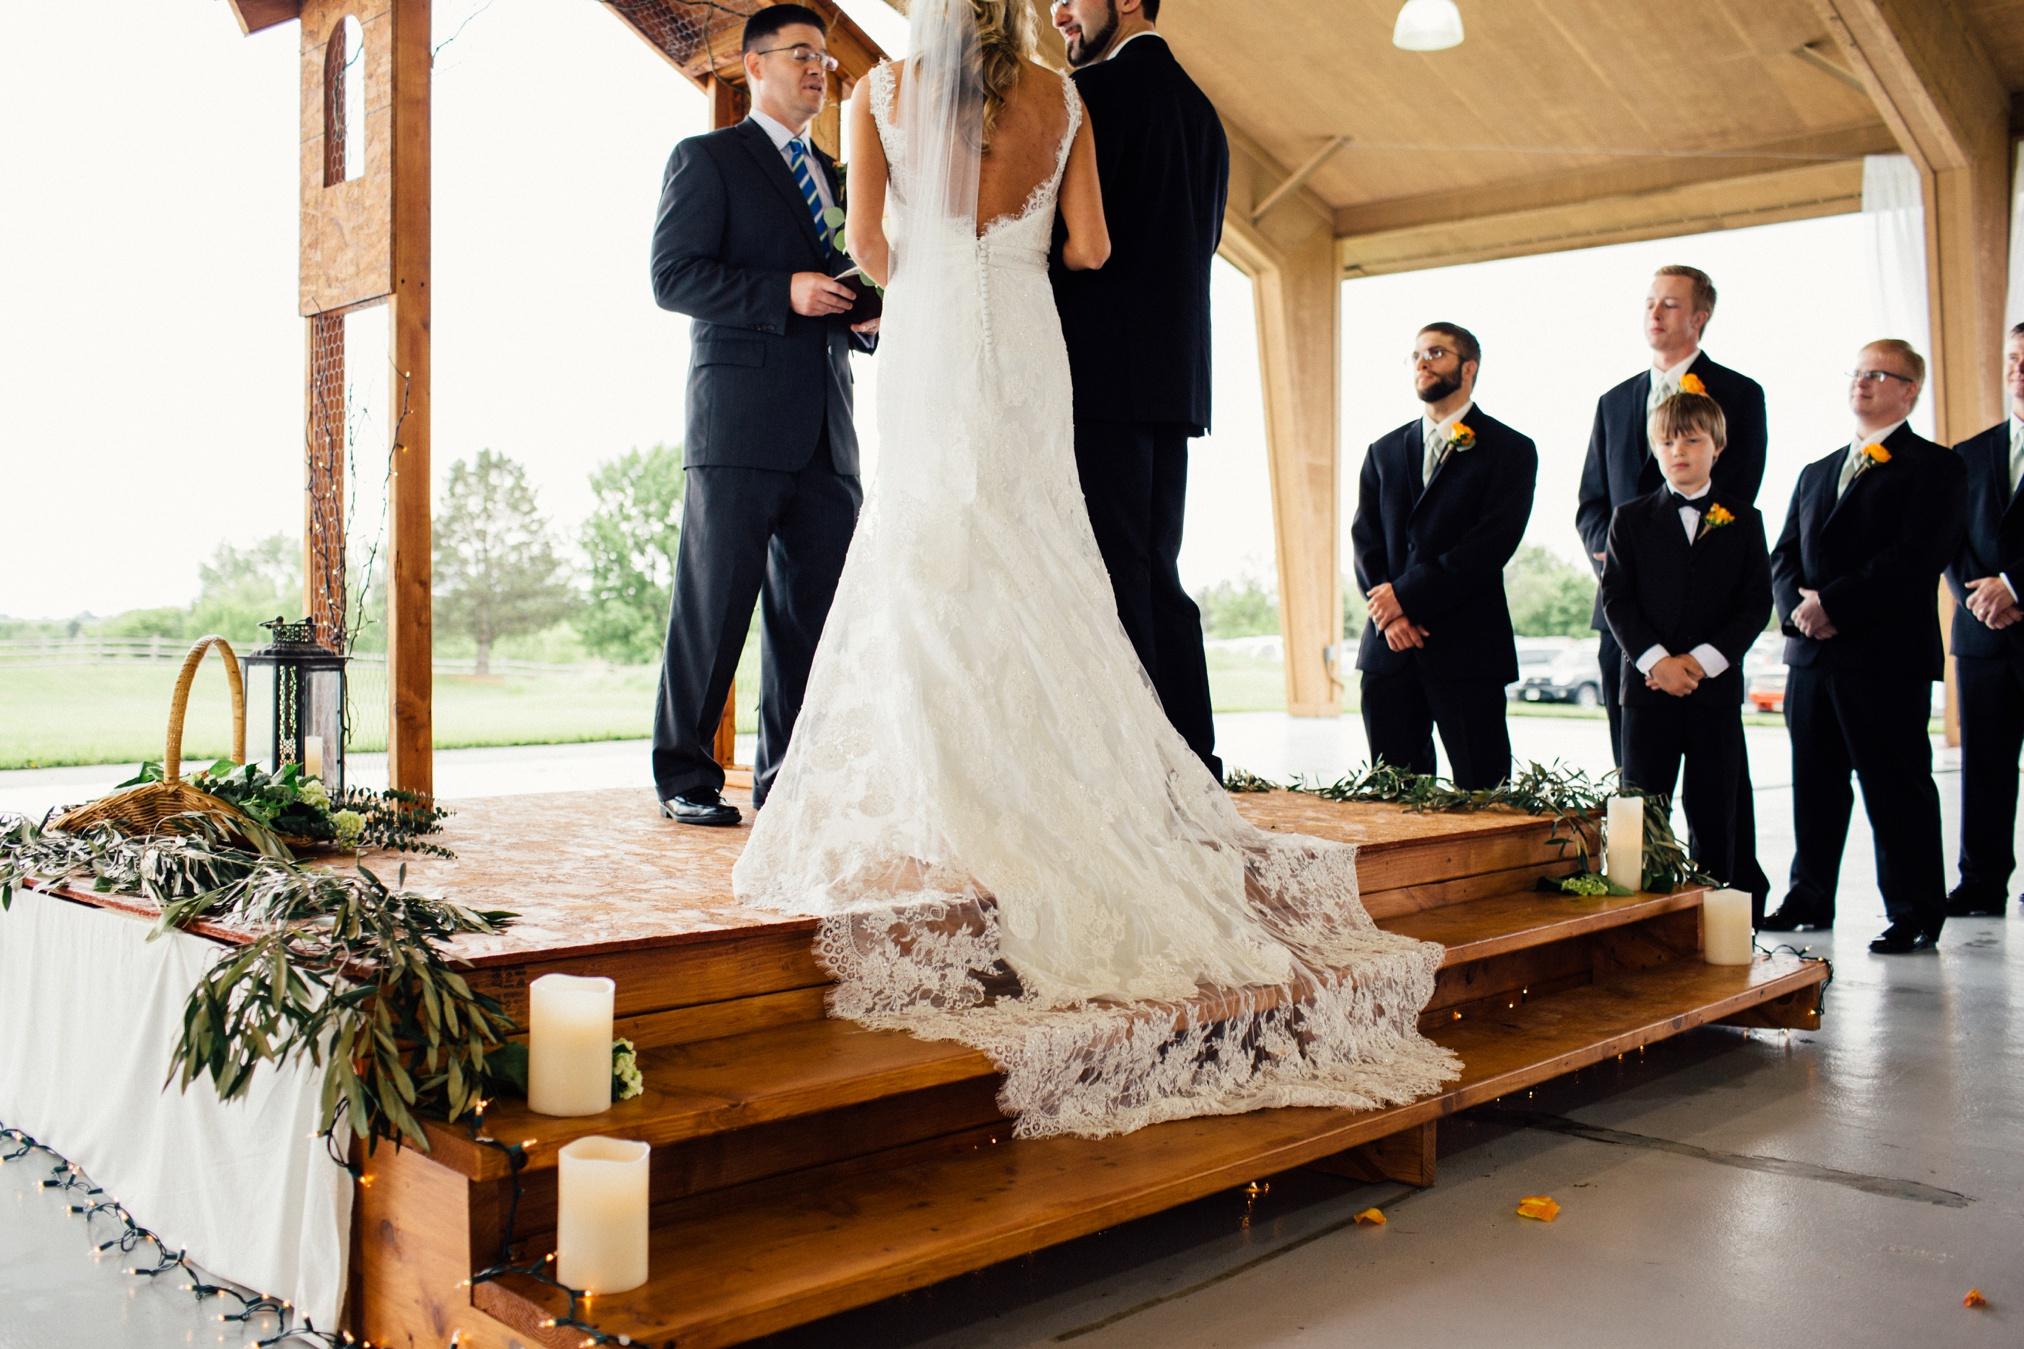 schmid_wedding-406.jpg